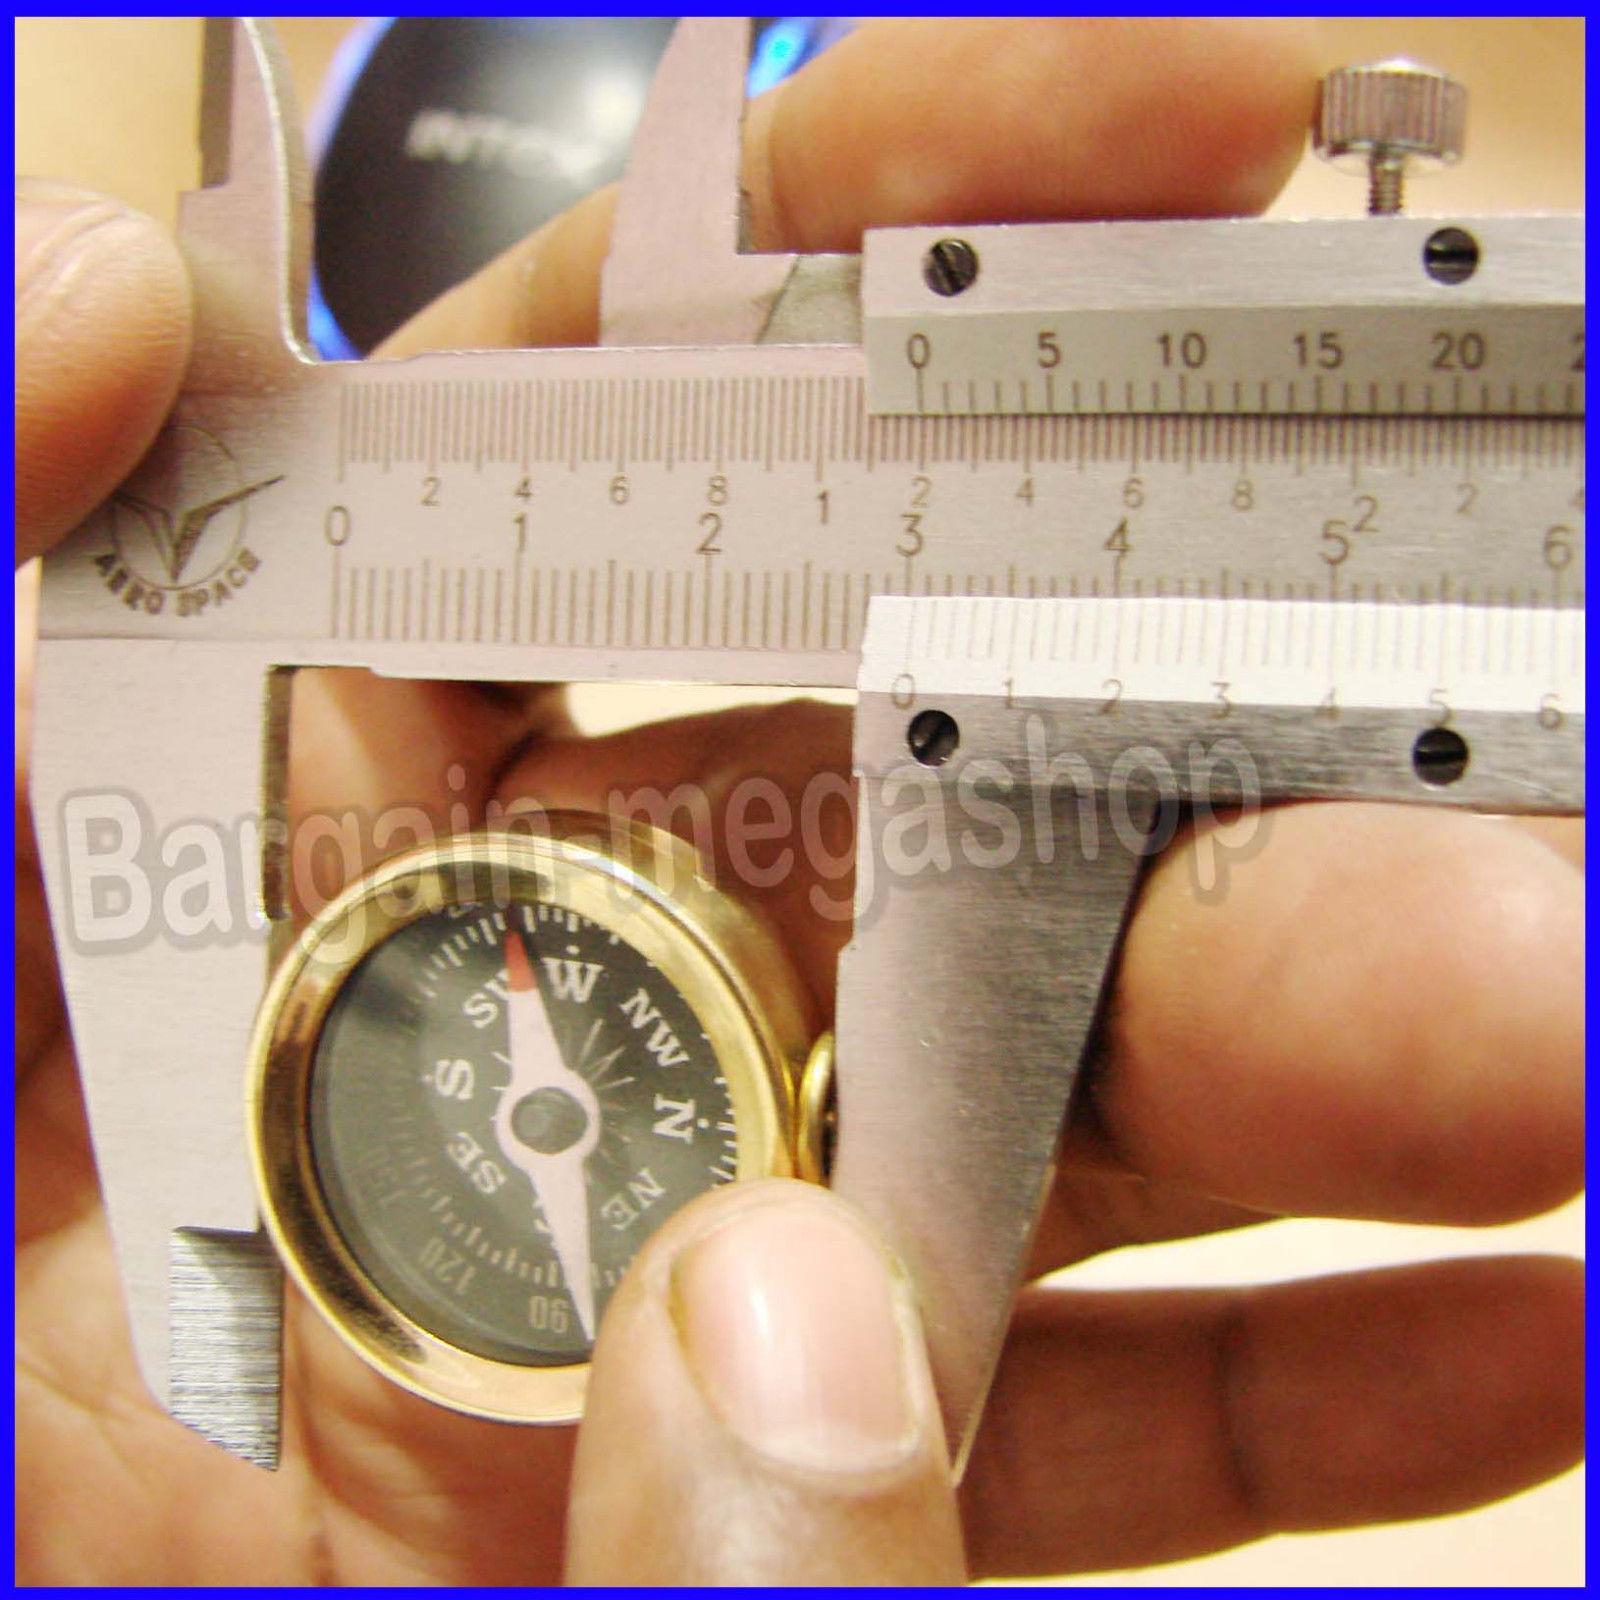 Brass Compass Keychain Nautical Lot of 100 Pcs Antique Wholesale Lot Home Decor